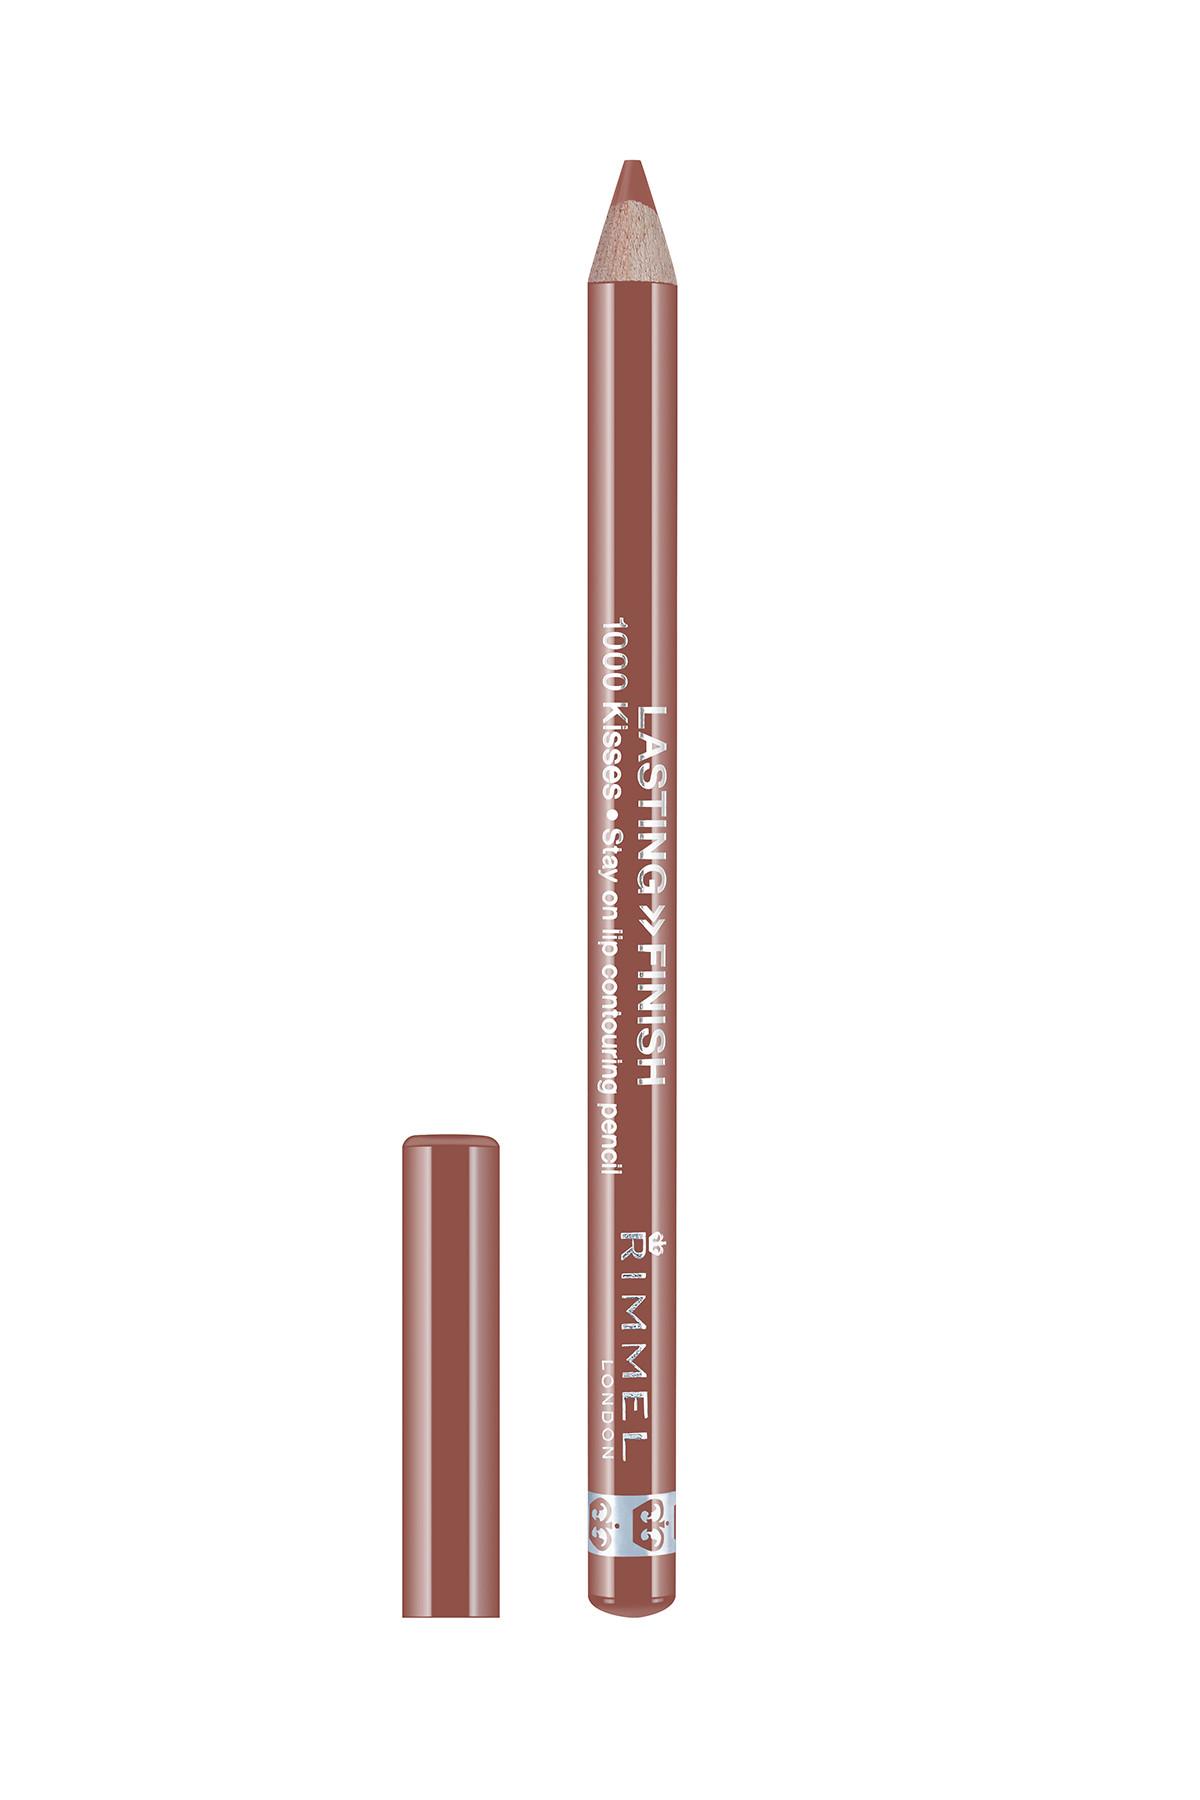 RIMMEL LONDON Dudak Kalemi - Lasting Finish 1000 Kisses Lip Liner 050 Tiramisu 1,2 g 5012874027620 1